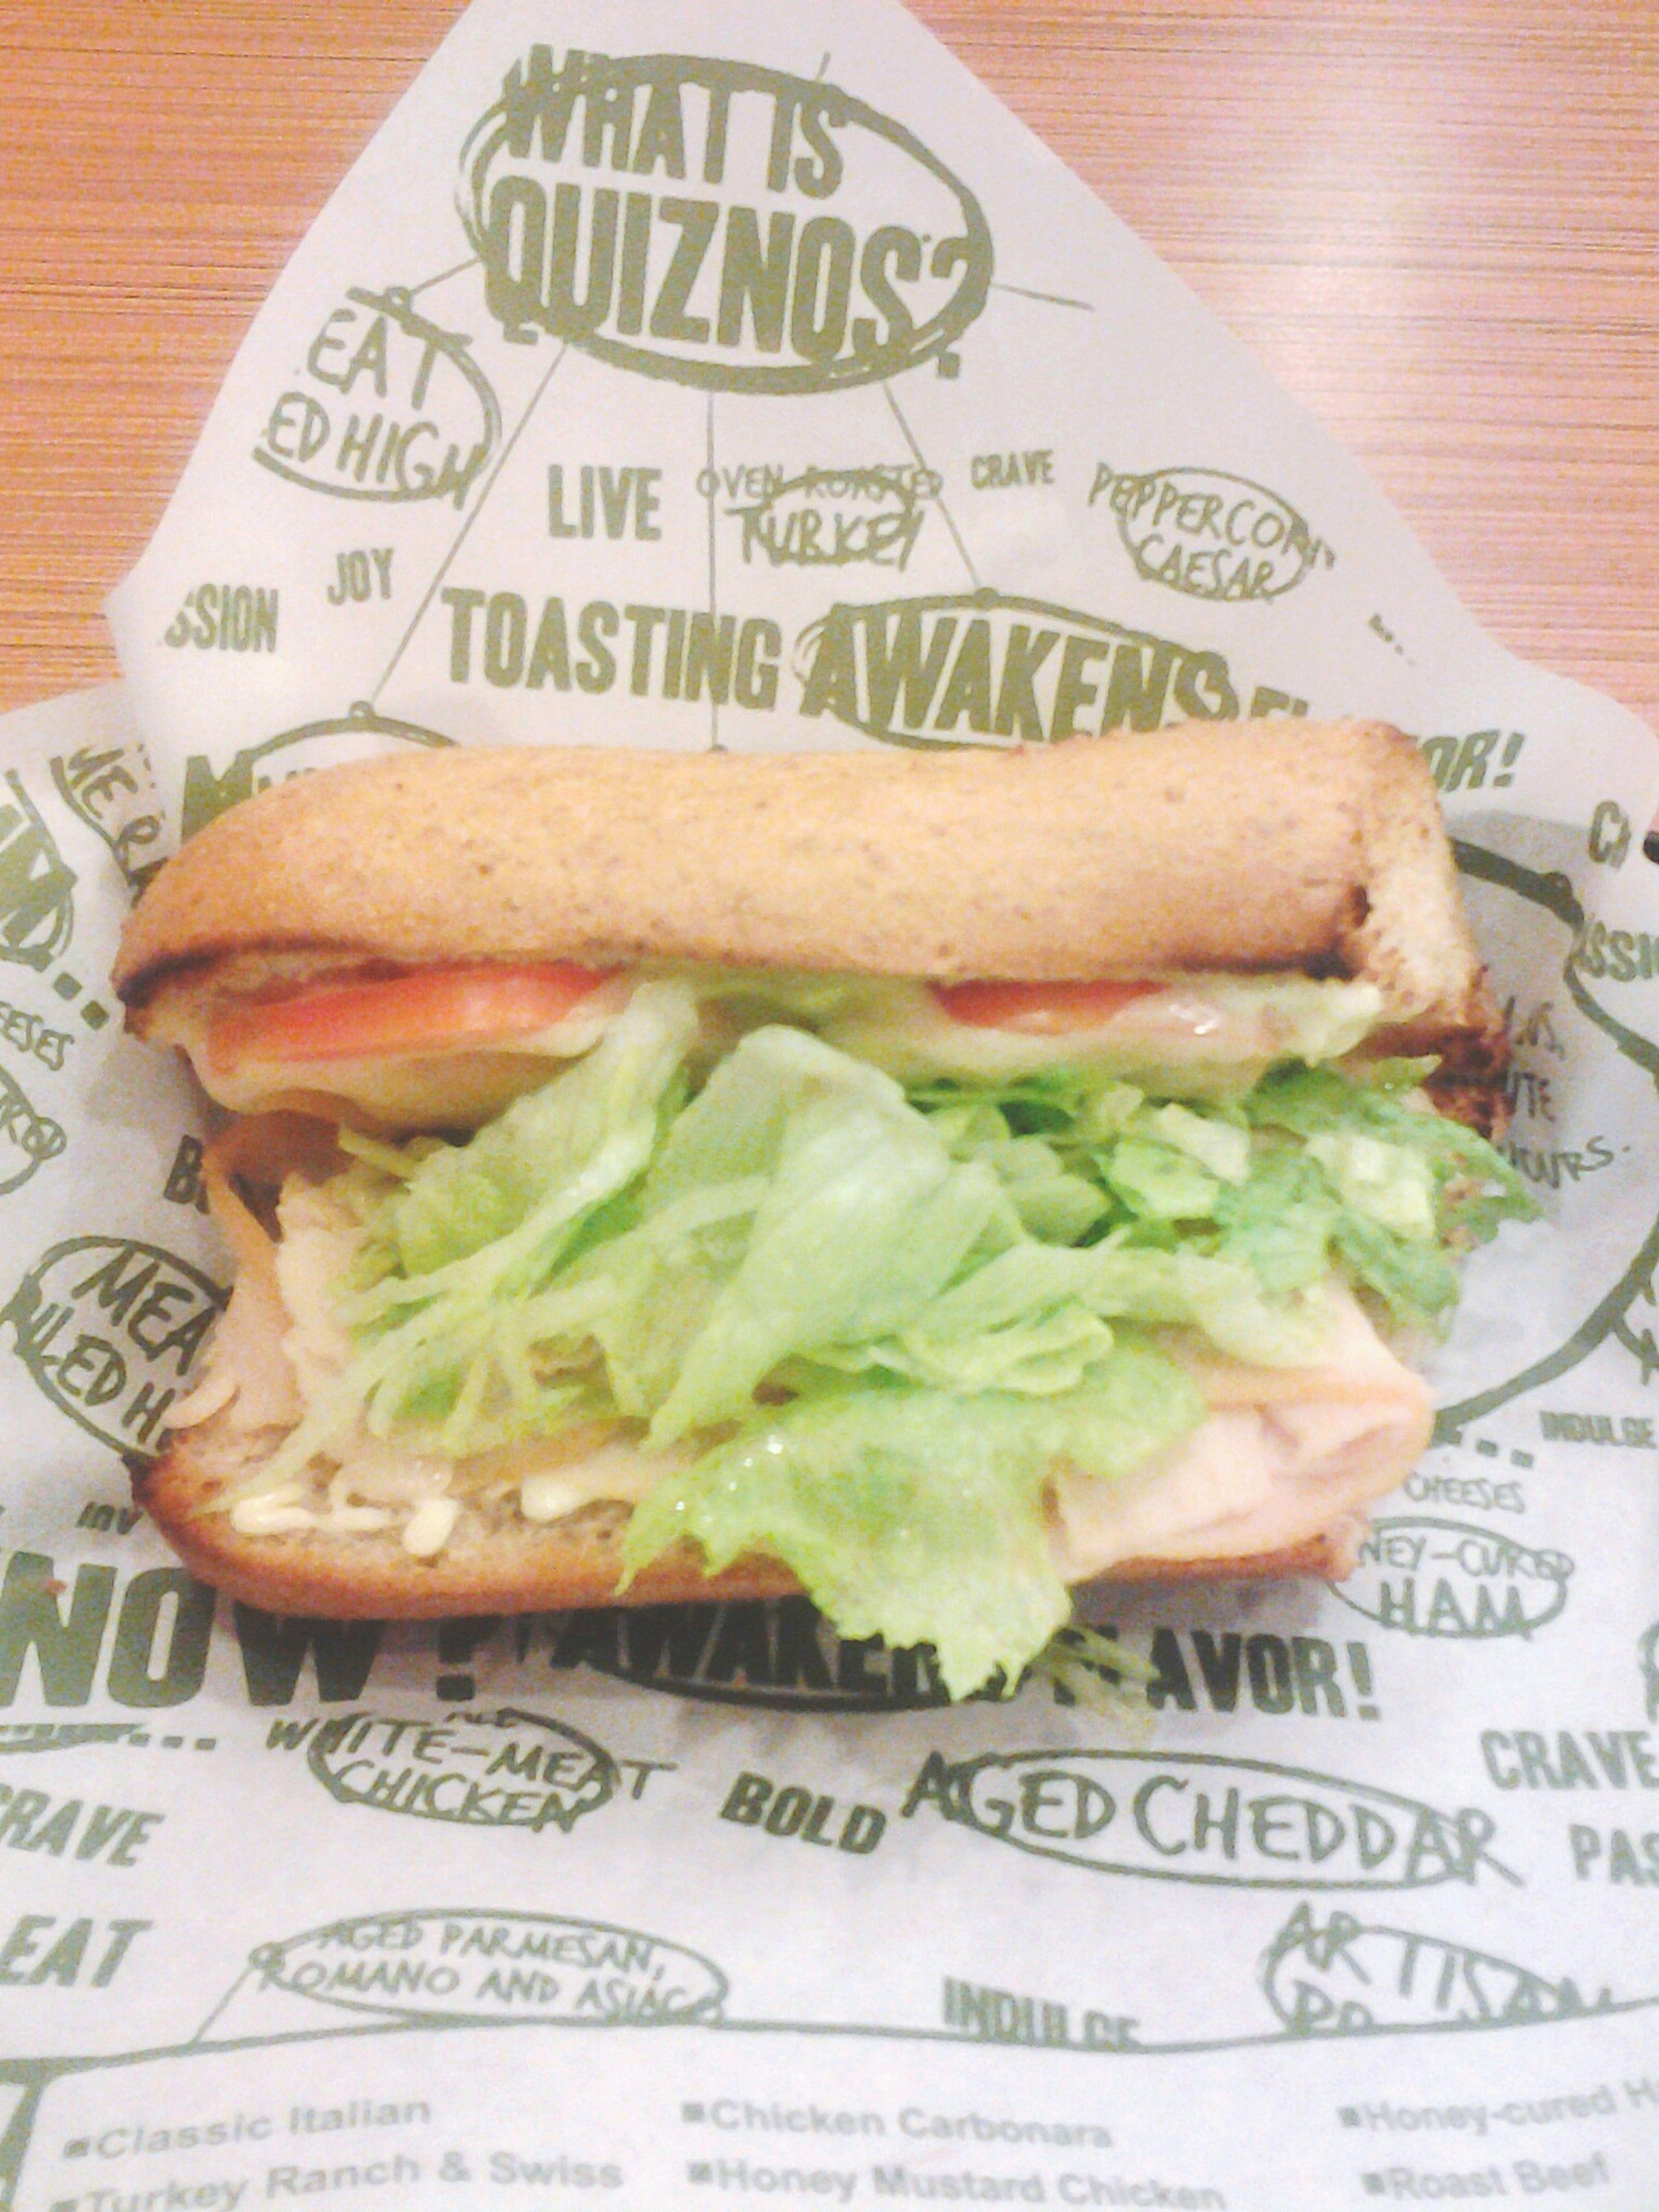 Fooooooodddd!!! This Is Not The Subway Sandwiches Quick Bite Philippines Food